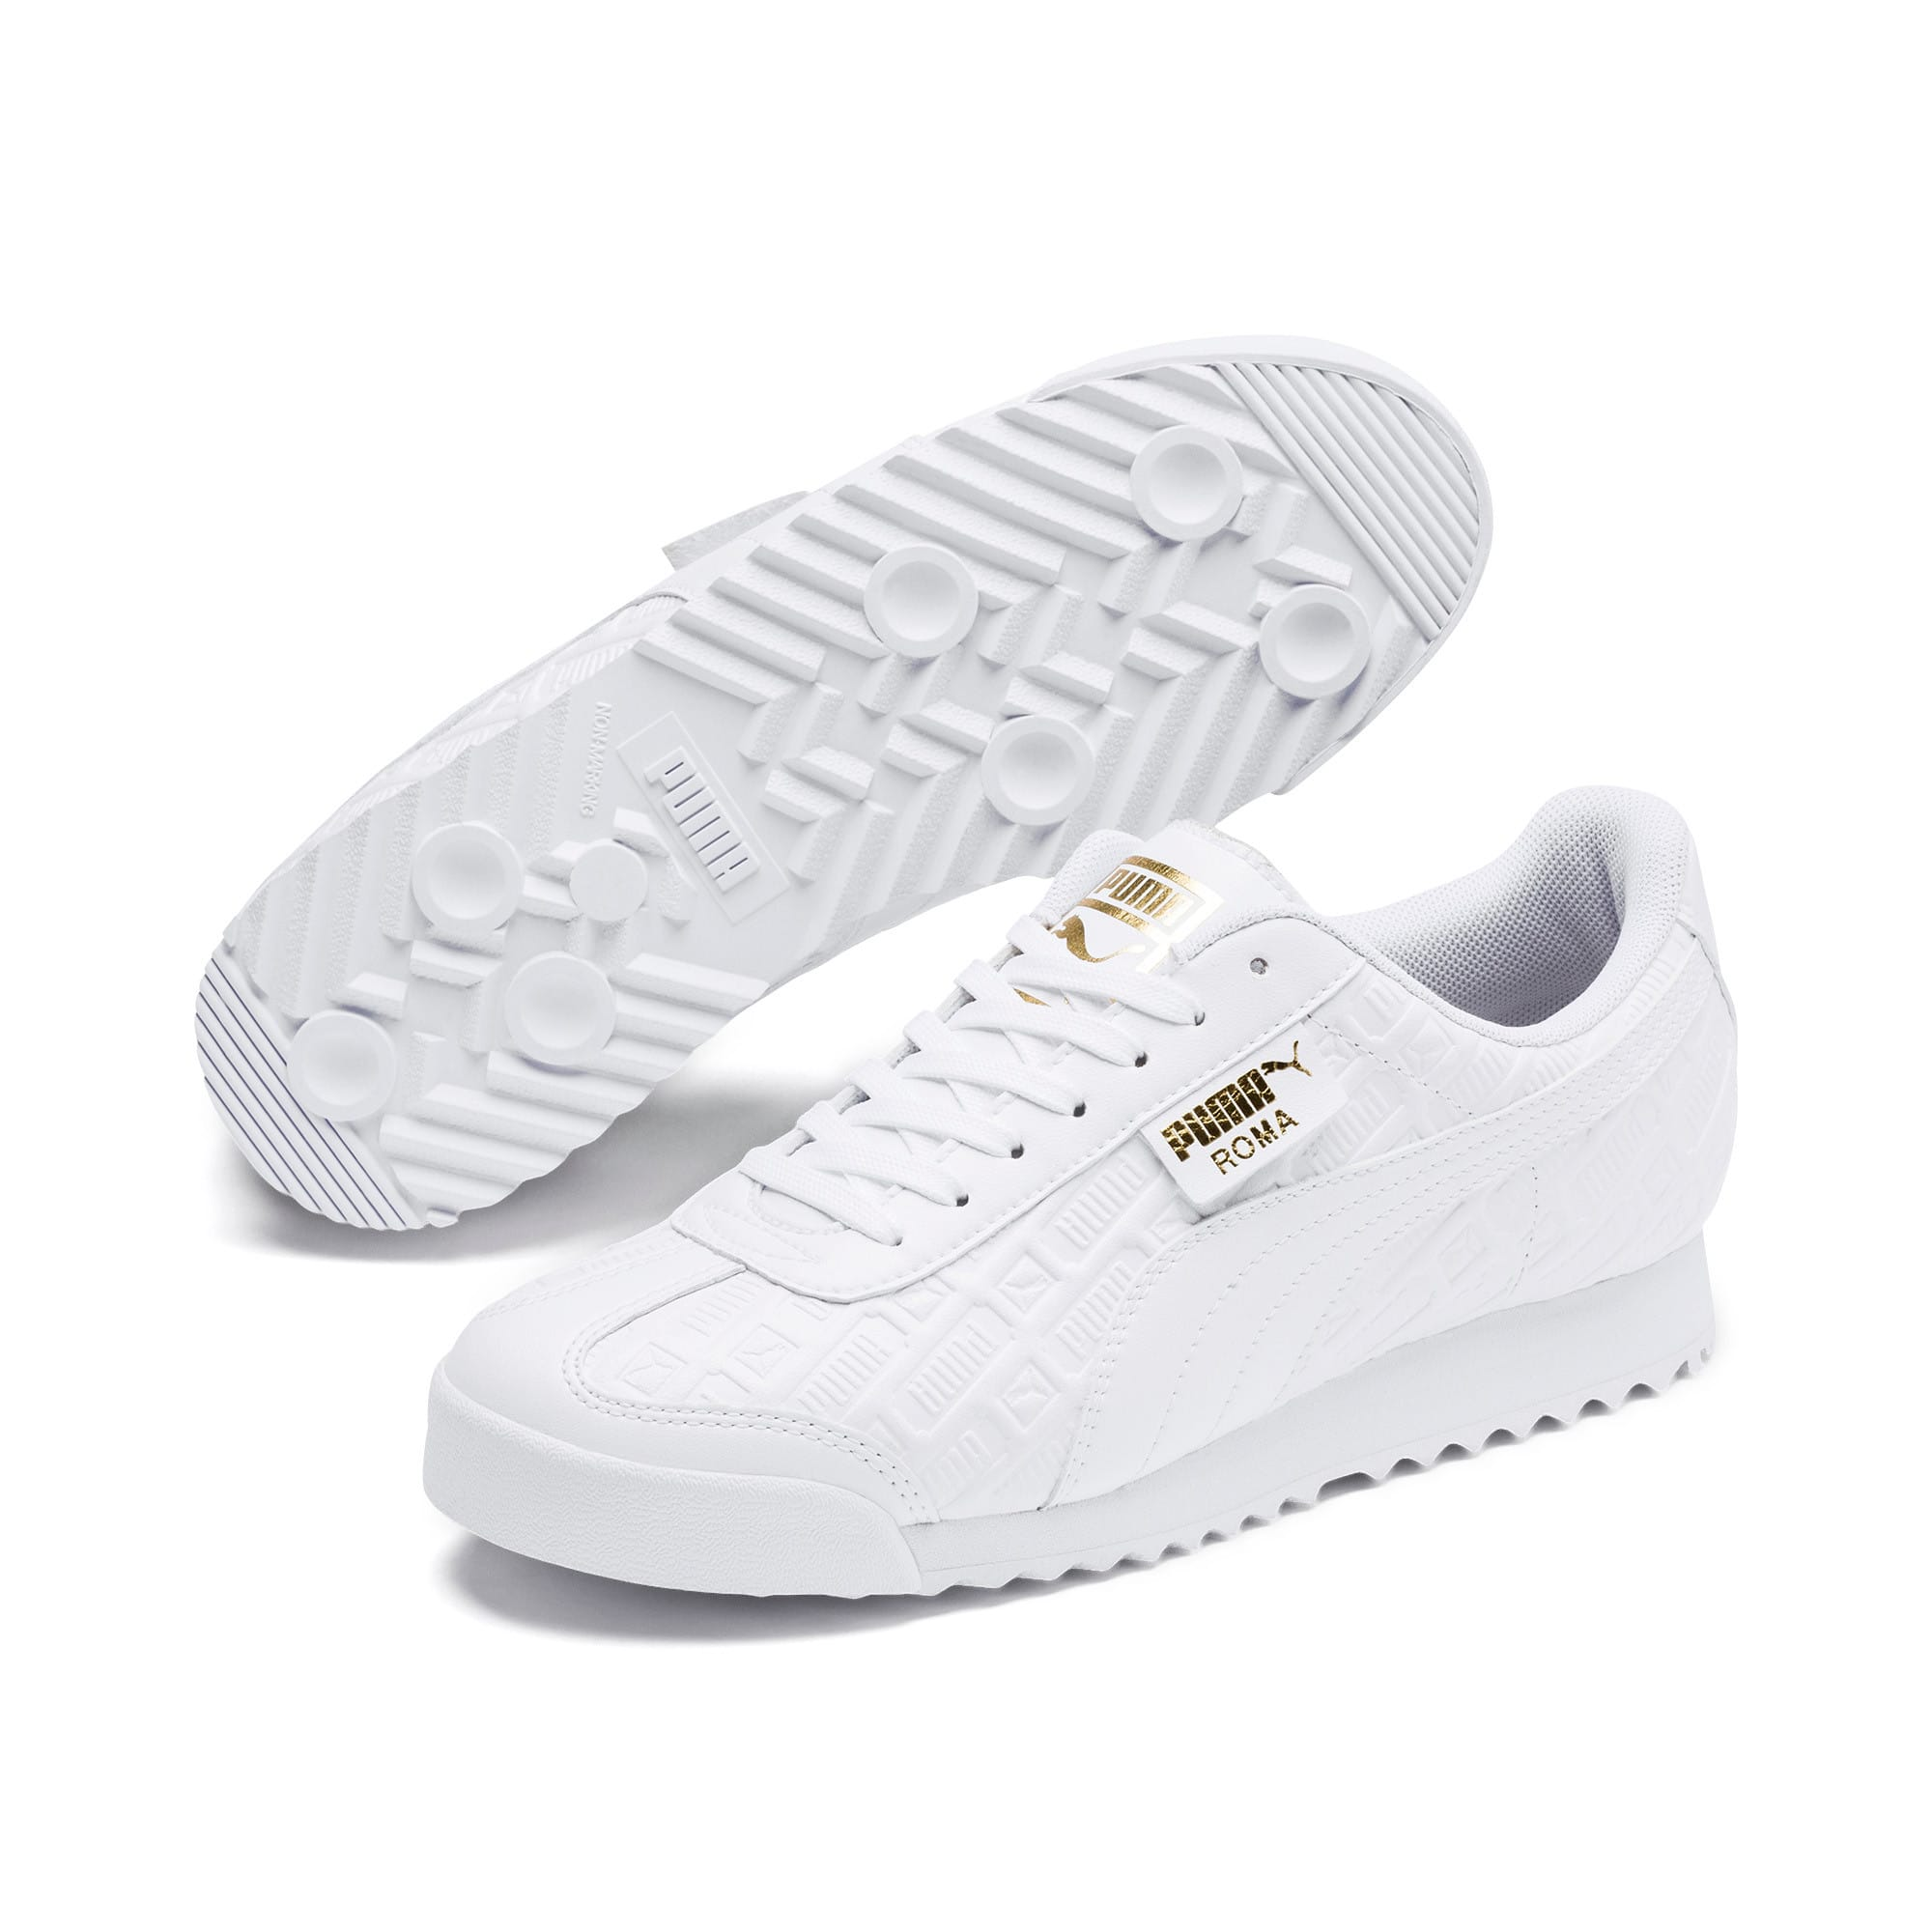 Thumbnail 3 of Roma Reinvent Women's Sneakers, Puma White-Puma Team Gold, medium